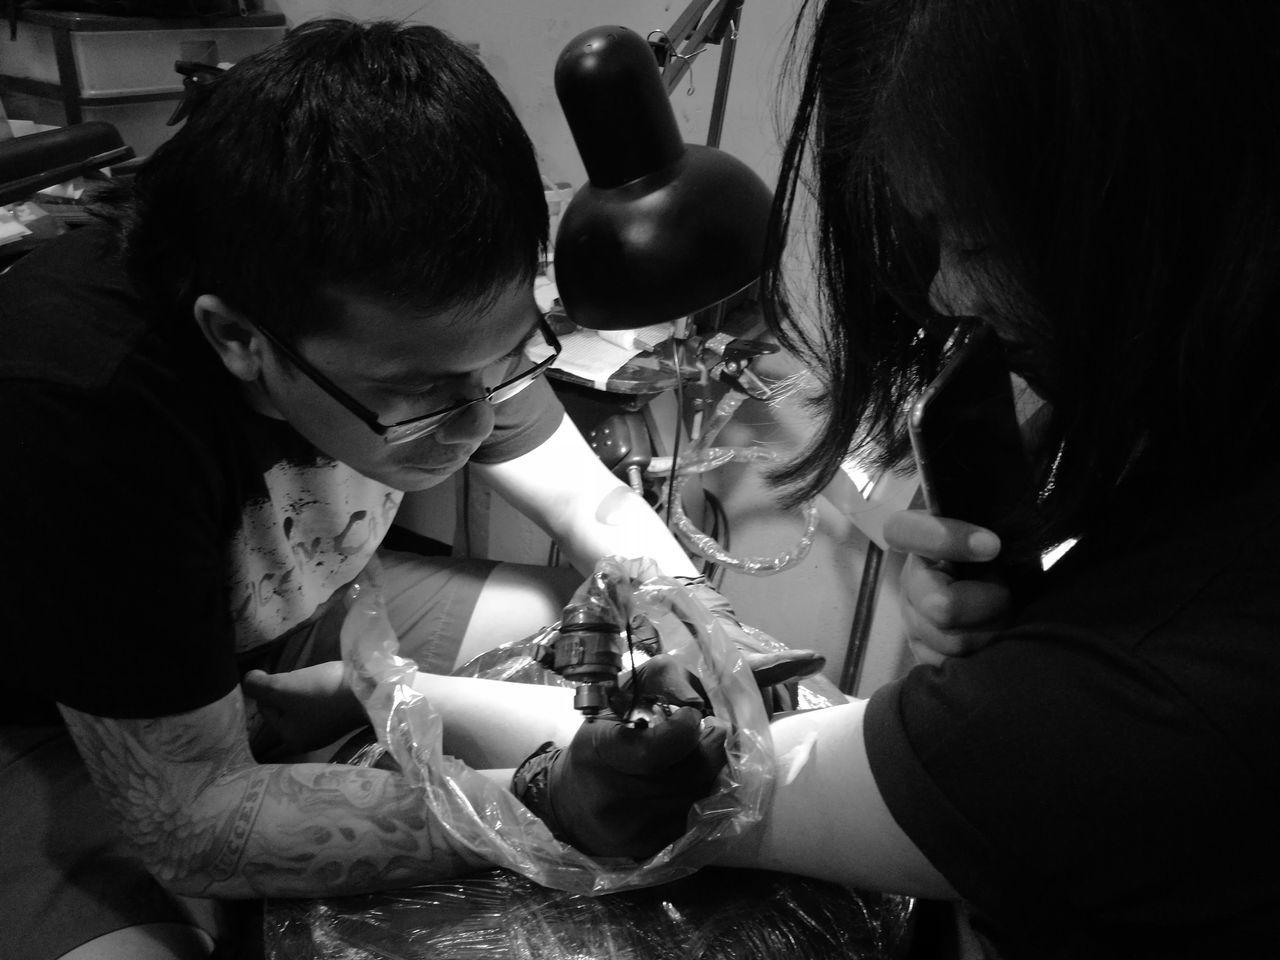 Tattoo Girl Real People Tattoo Tattoo Shop MonochromePhotography Philippines